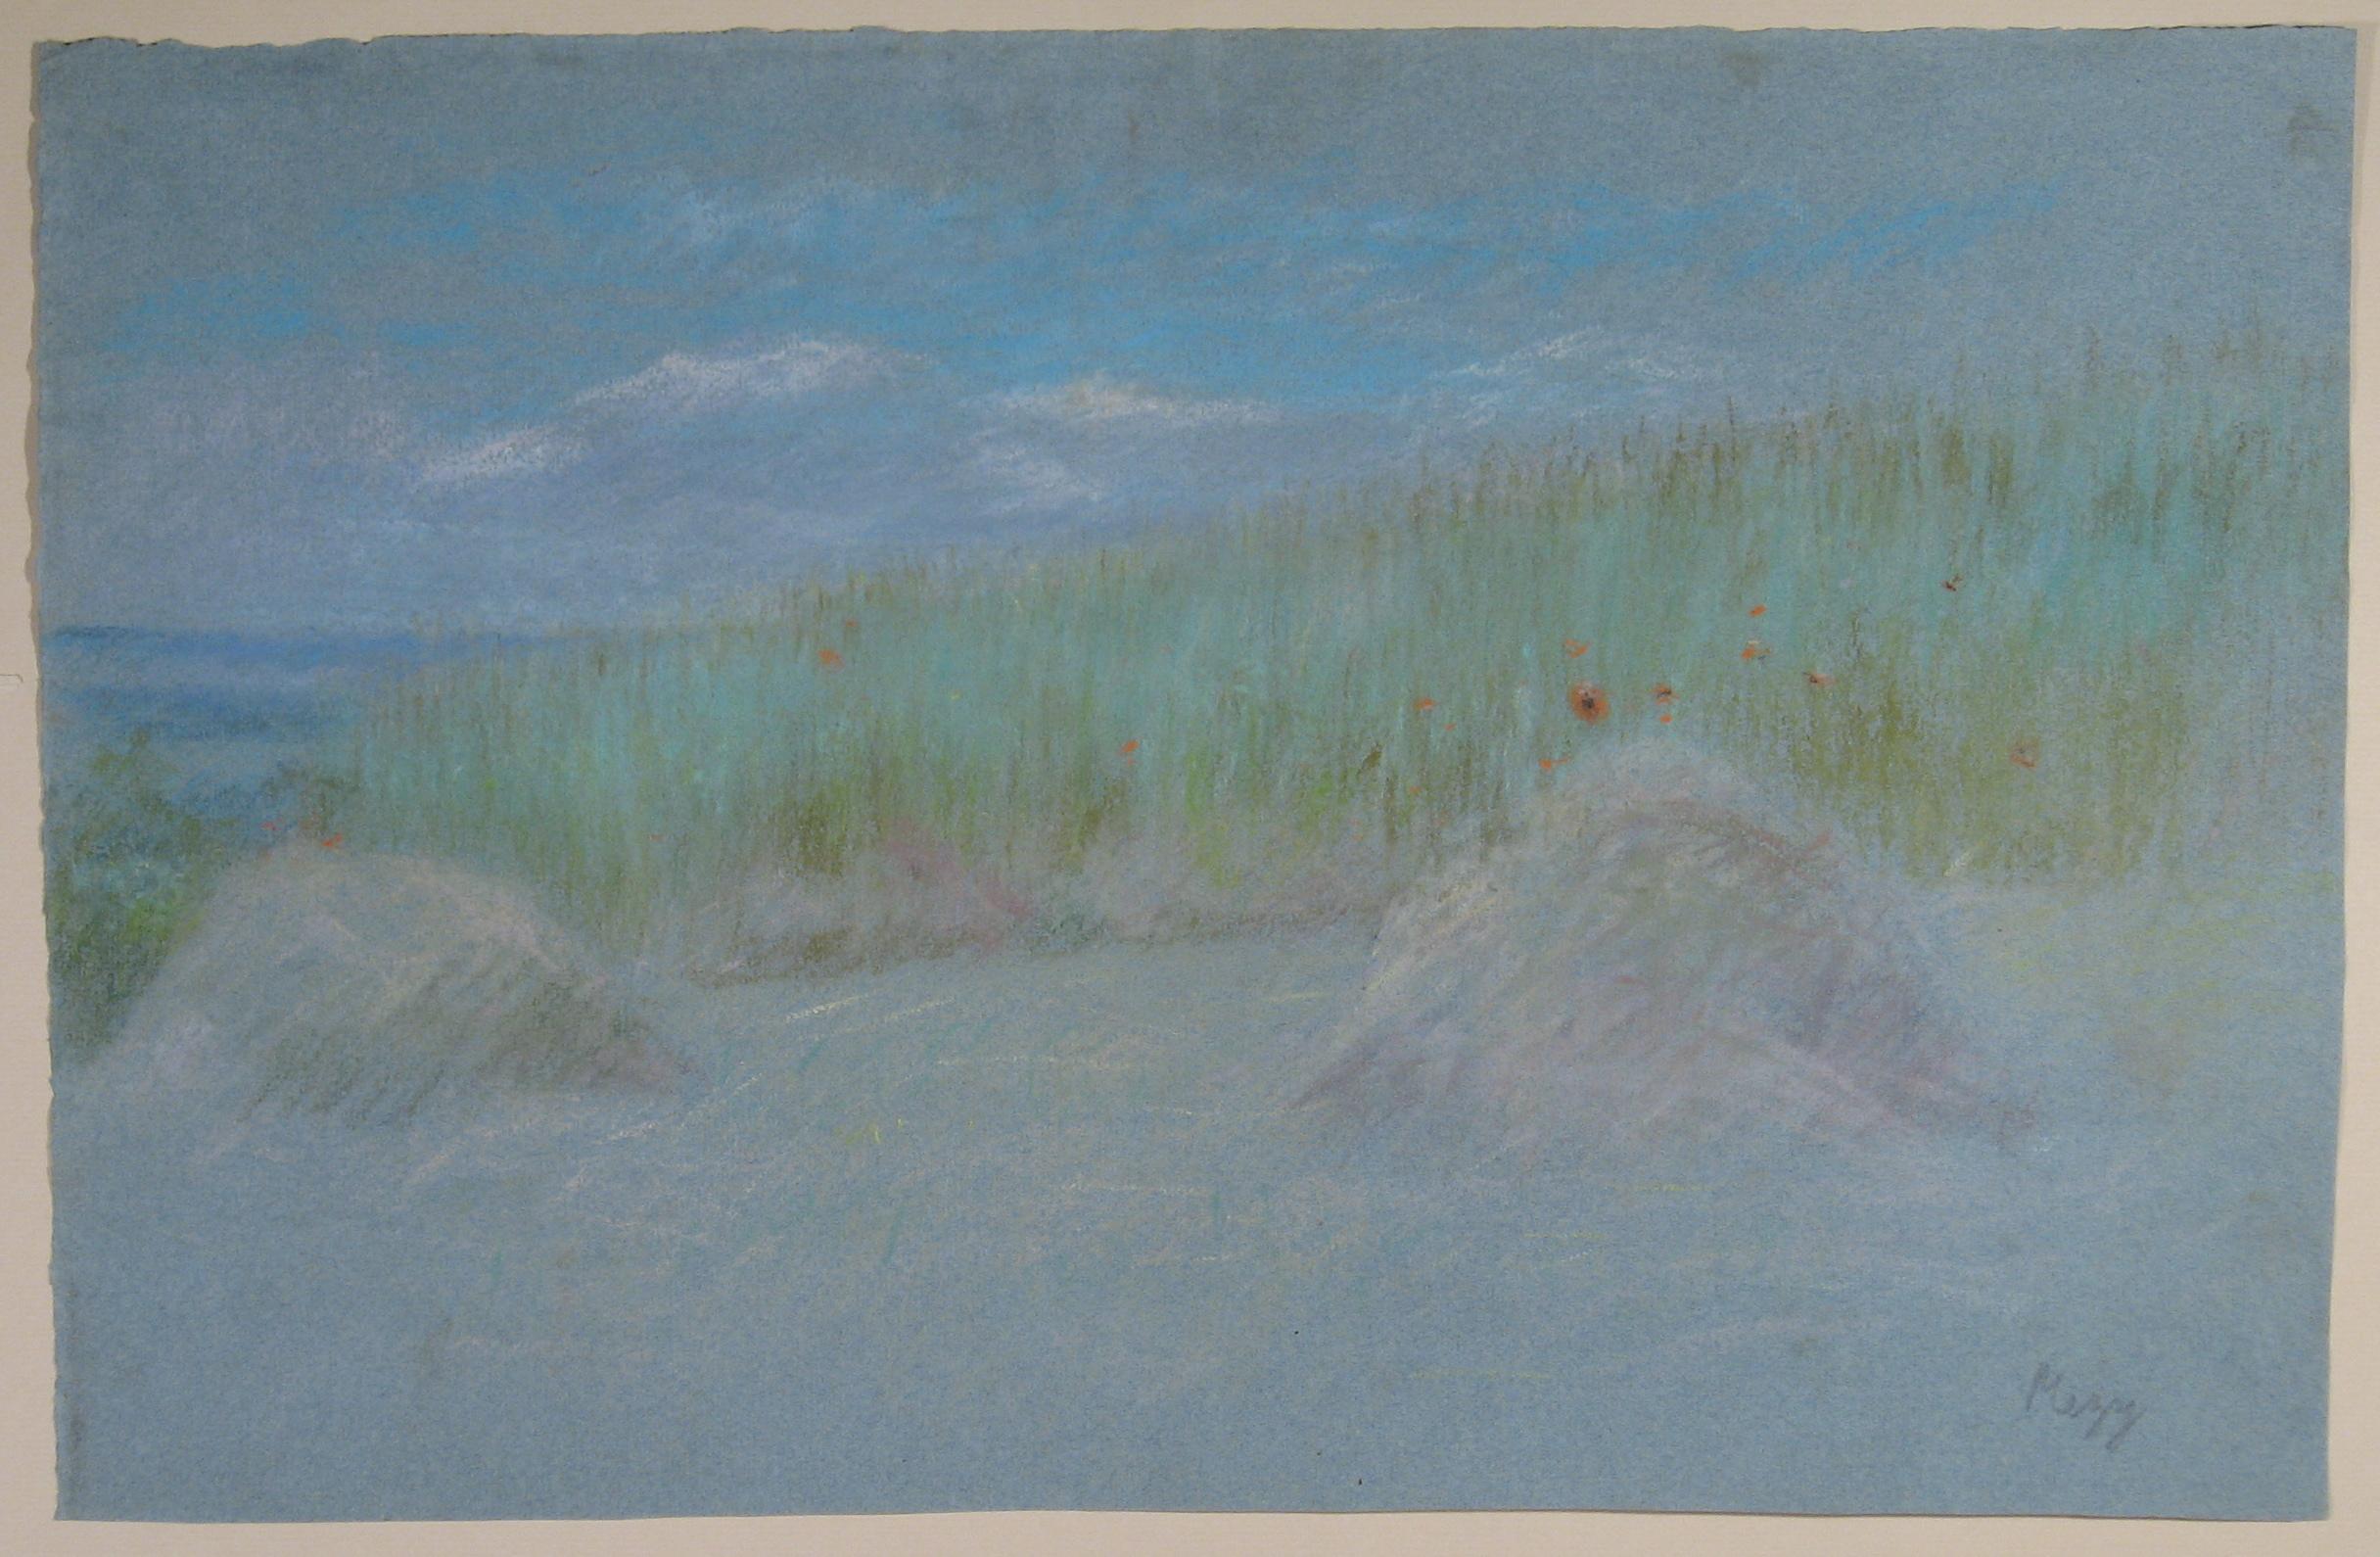 Title: Bottes de foin et coquelicots dans un pre / Haystacks and poppies in a field Year: c. 1914 Medium: Pastel on gray blue paper Image size: 18 x 12